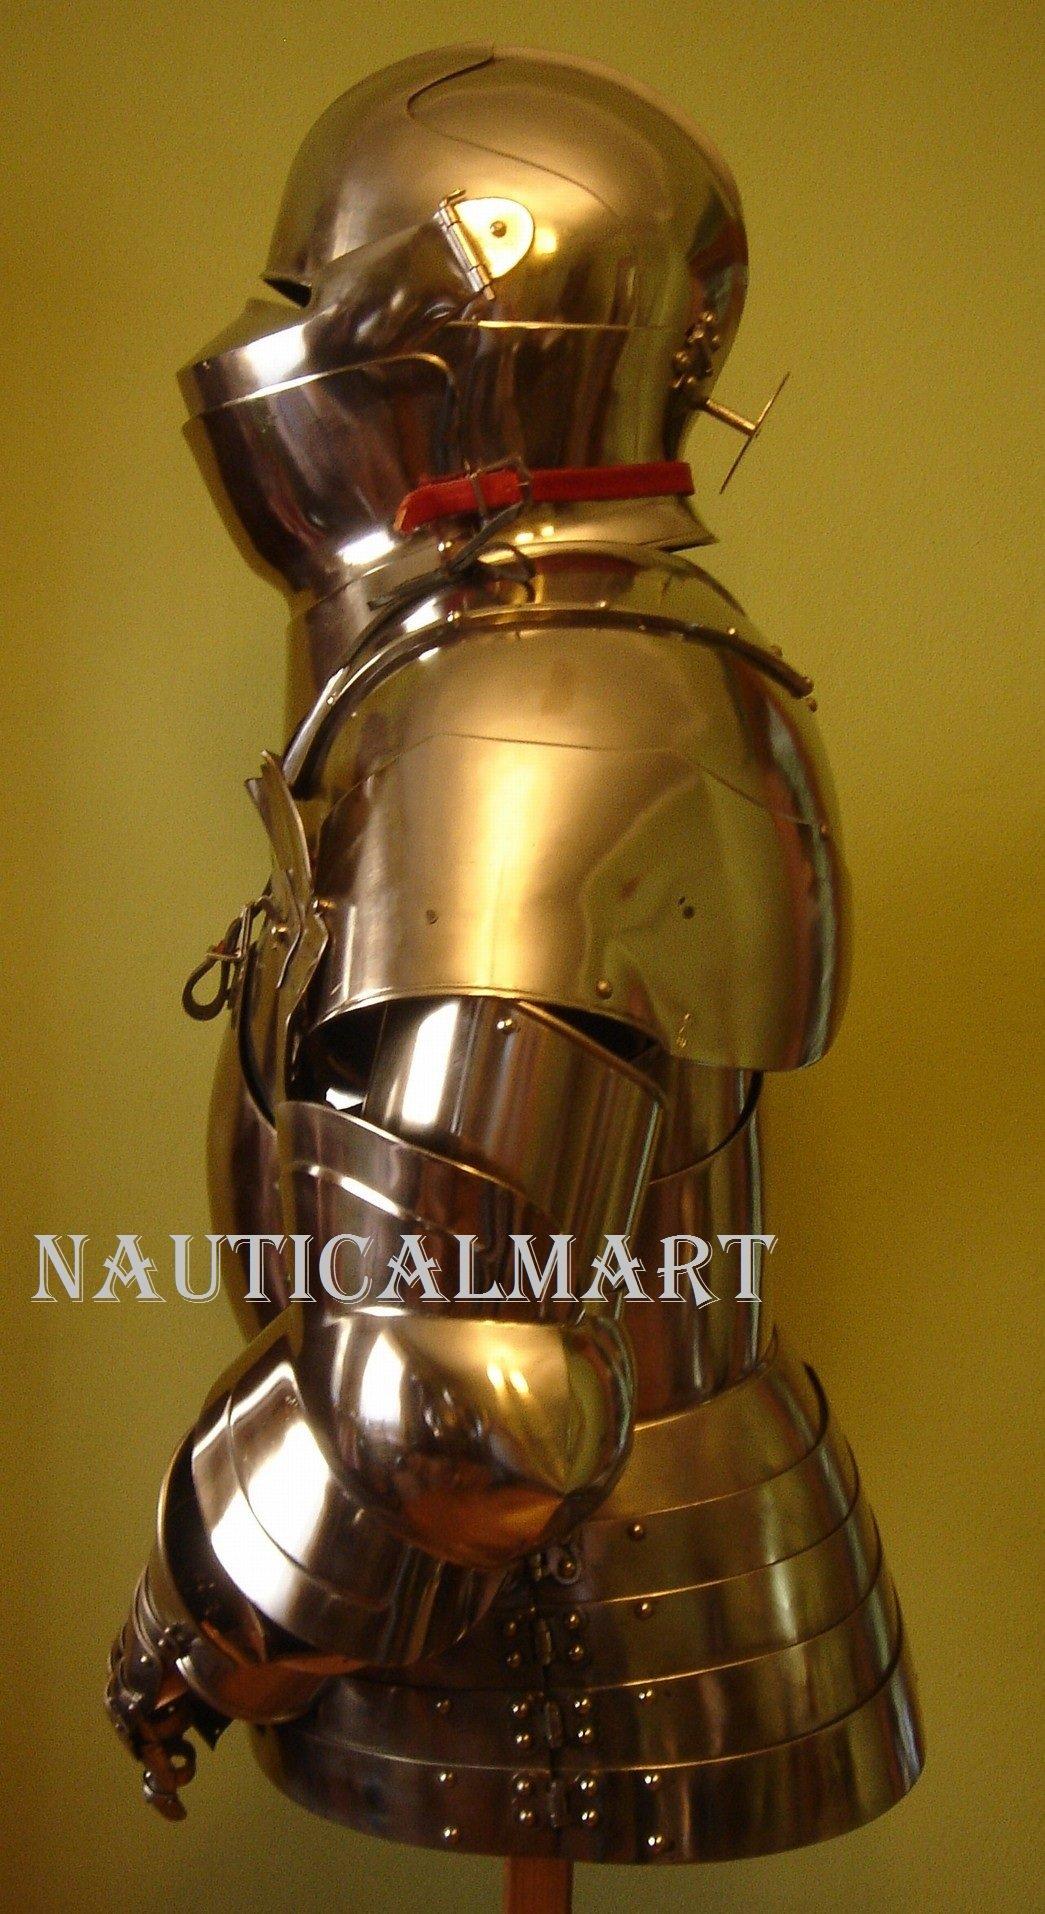 Armor Costume Steel Medieval Suit of Armor Breastplate with Helmet by NAUTICALMART (Image #2)